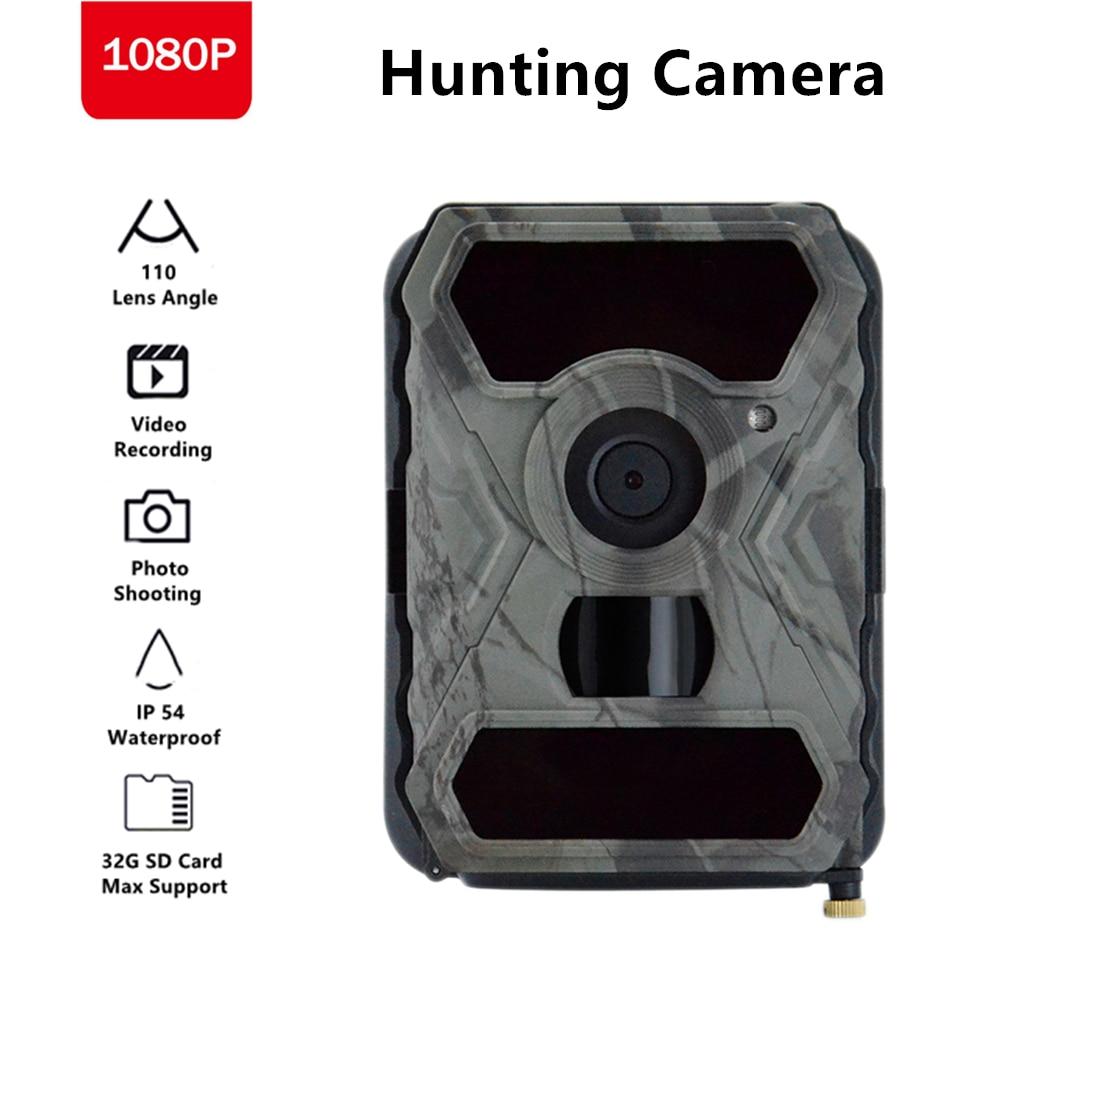 Cámara de caza S880G 12MP 1080P cámara de caza cámara de vigilancia salvaje IR visión nocturna cámaras de exploración de vida silvestre